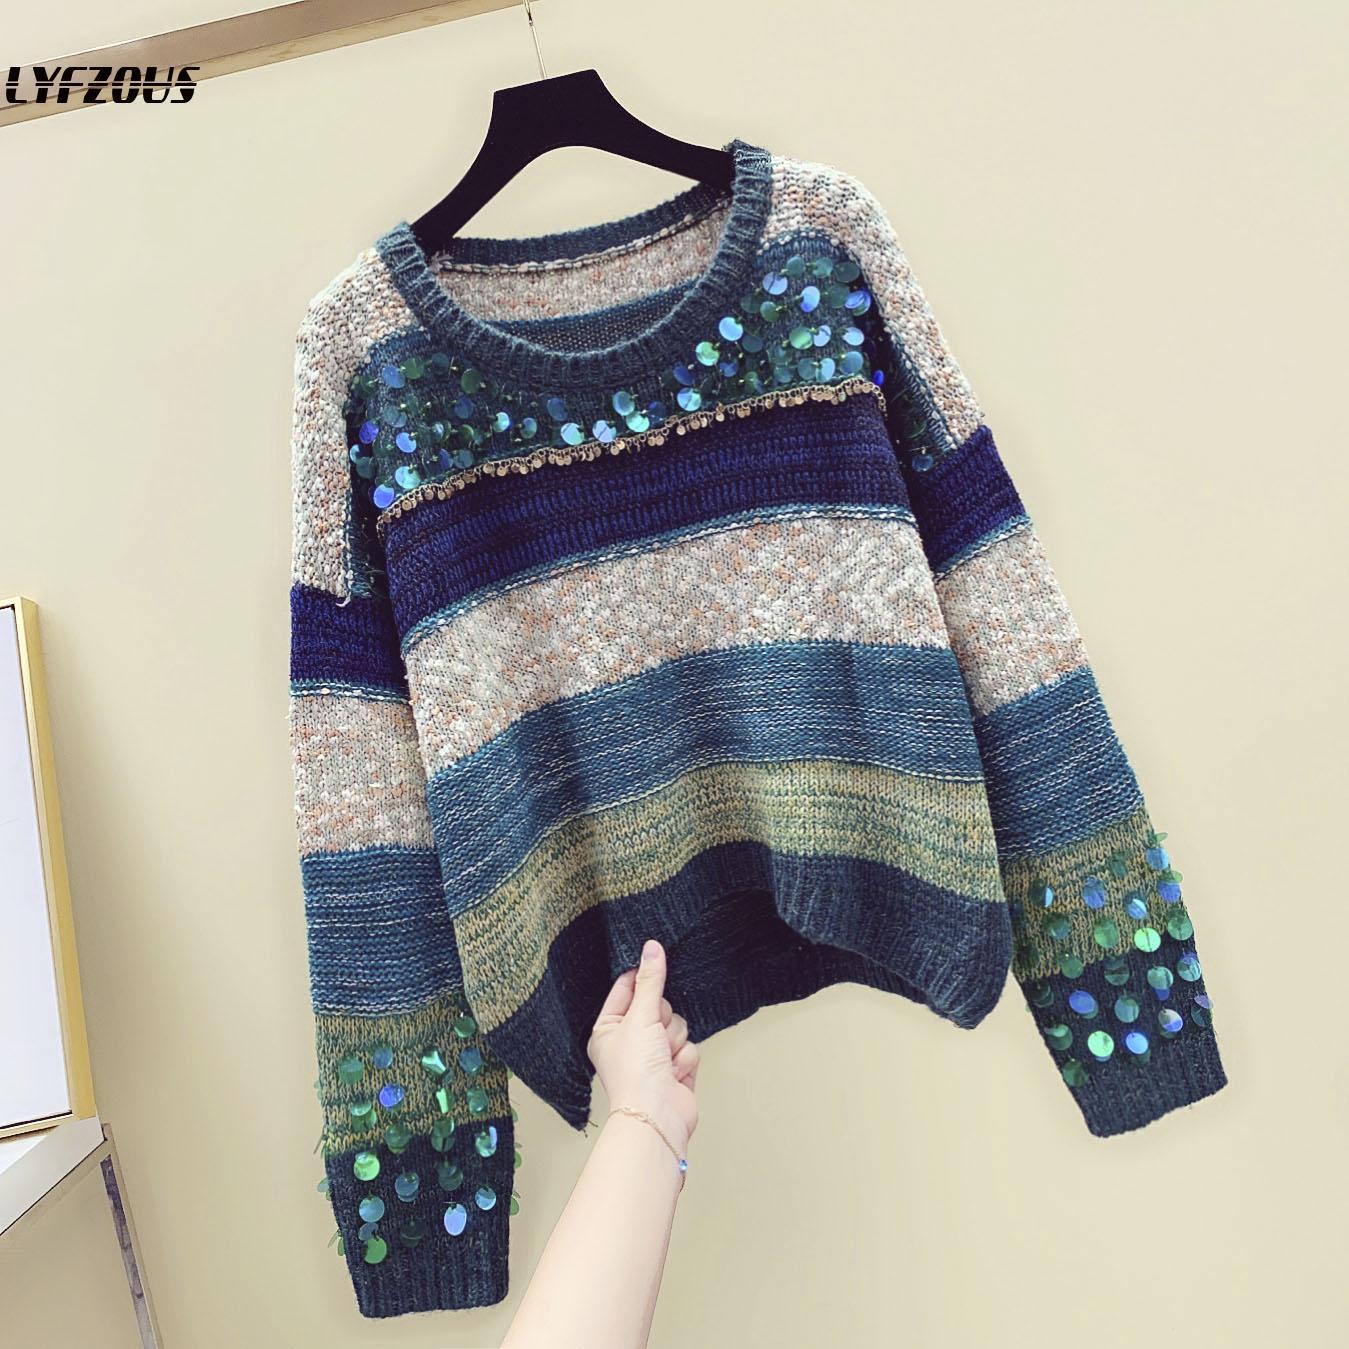 Mulheres de Lantejoulas Camisola Pulôveres E camisolas Beading Manga Comprida Coreano Moda Knit Sweater Rainbow Listrado Solto Jumper Sueter Mujer